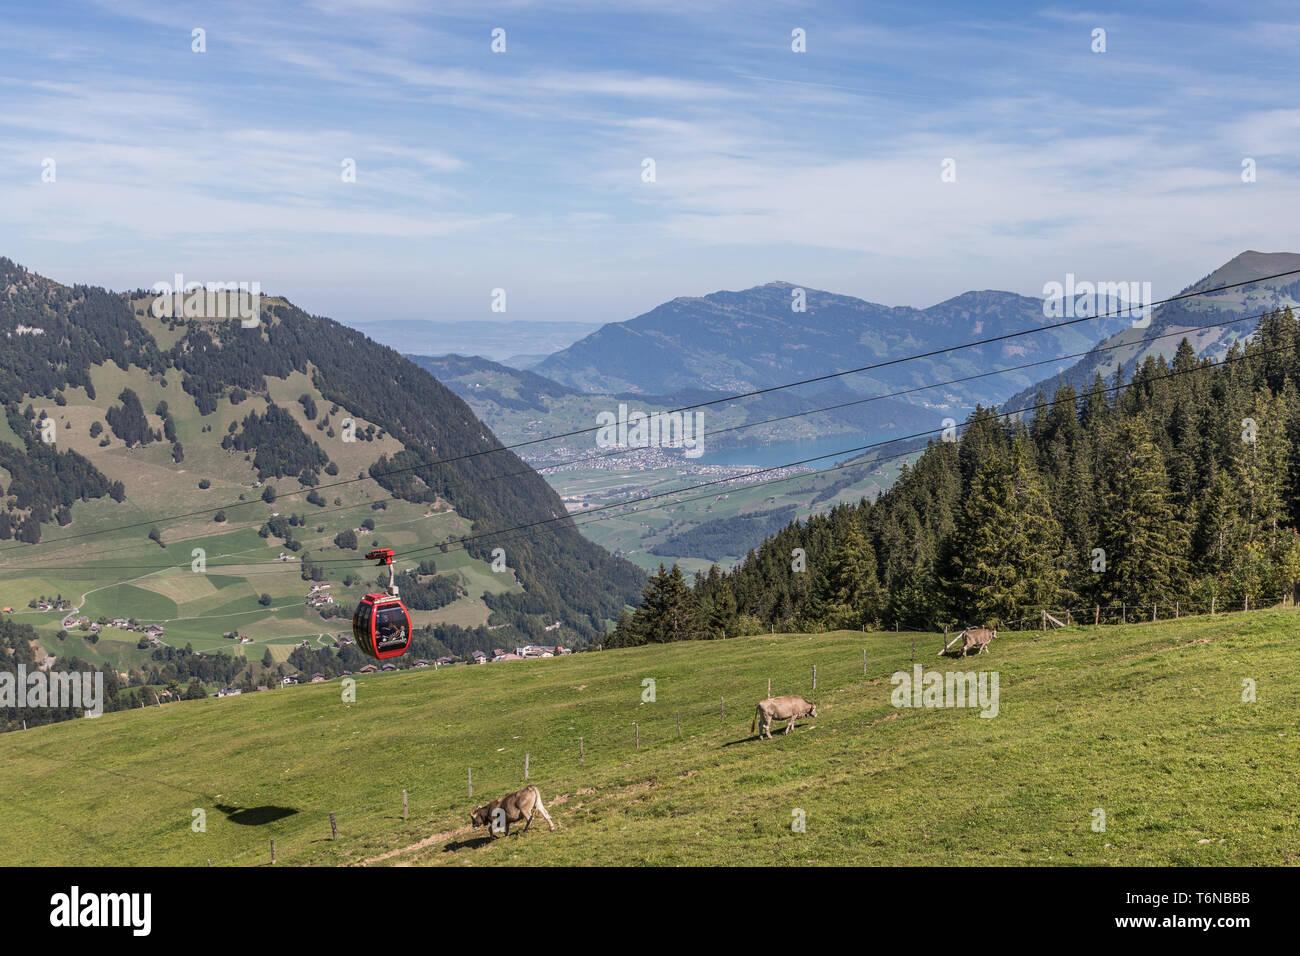 The aerial cableway Gummenalp, Nidwalden, Switzerland, Europe - Stock Image